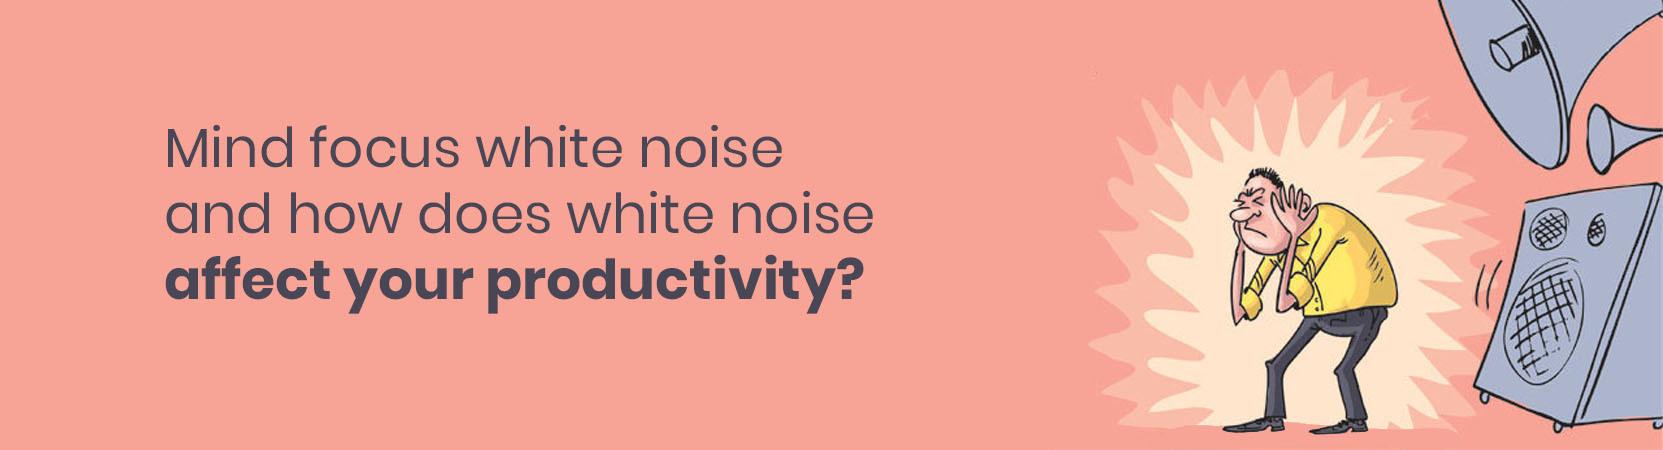 focus mind white noise